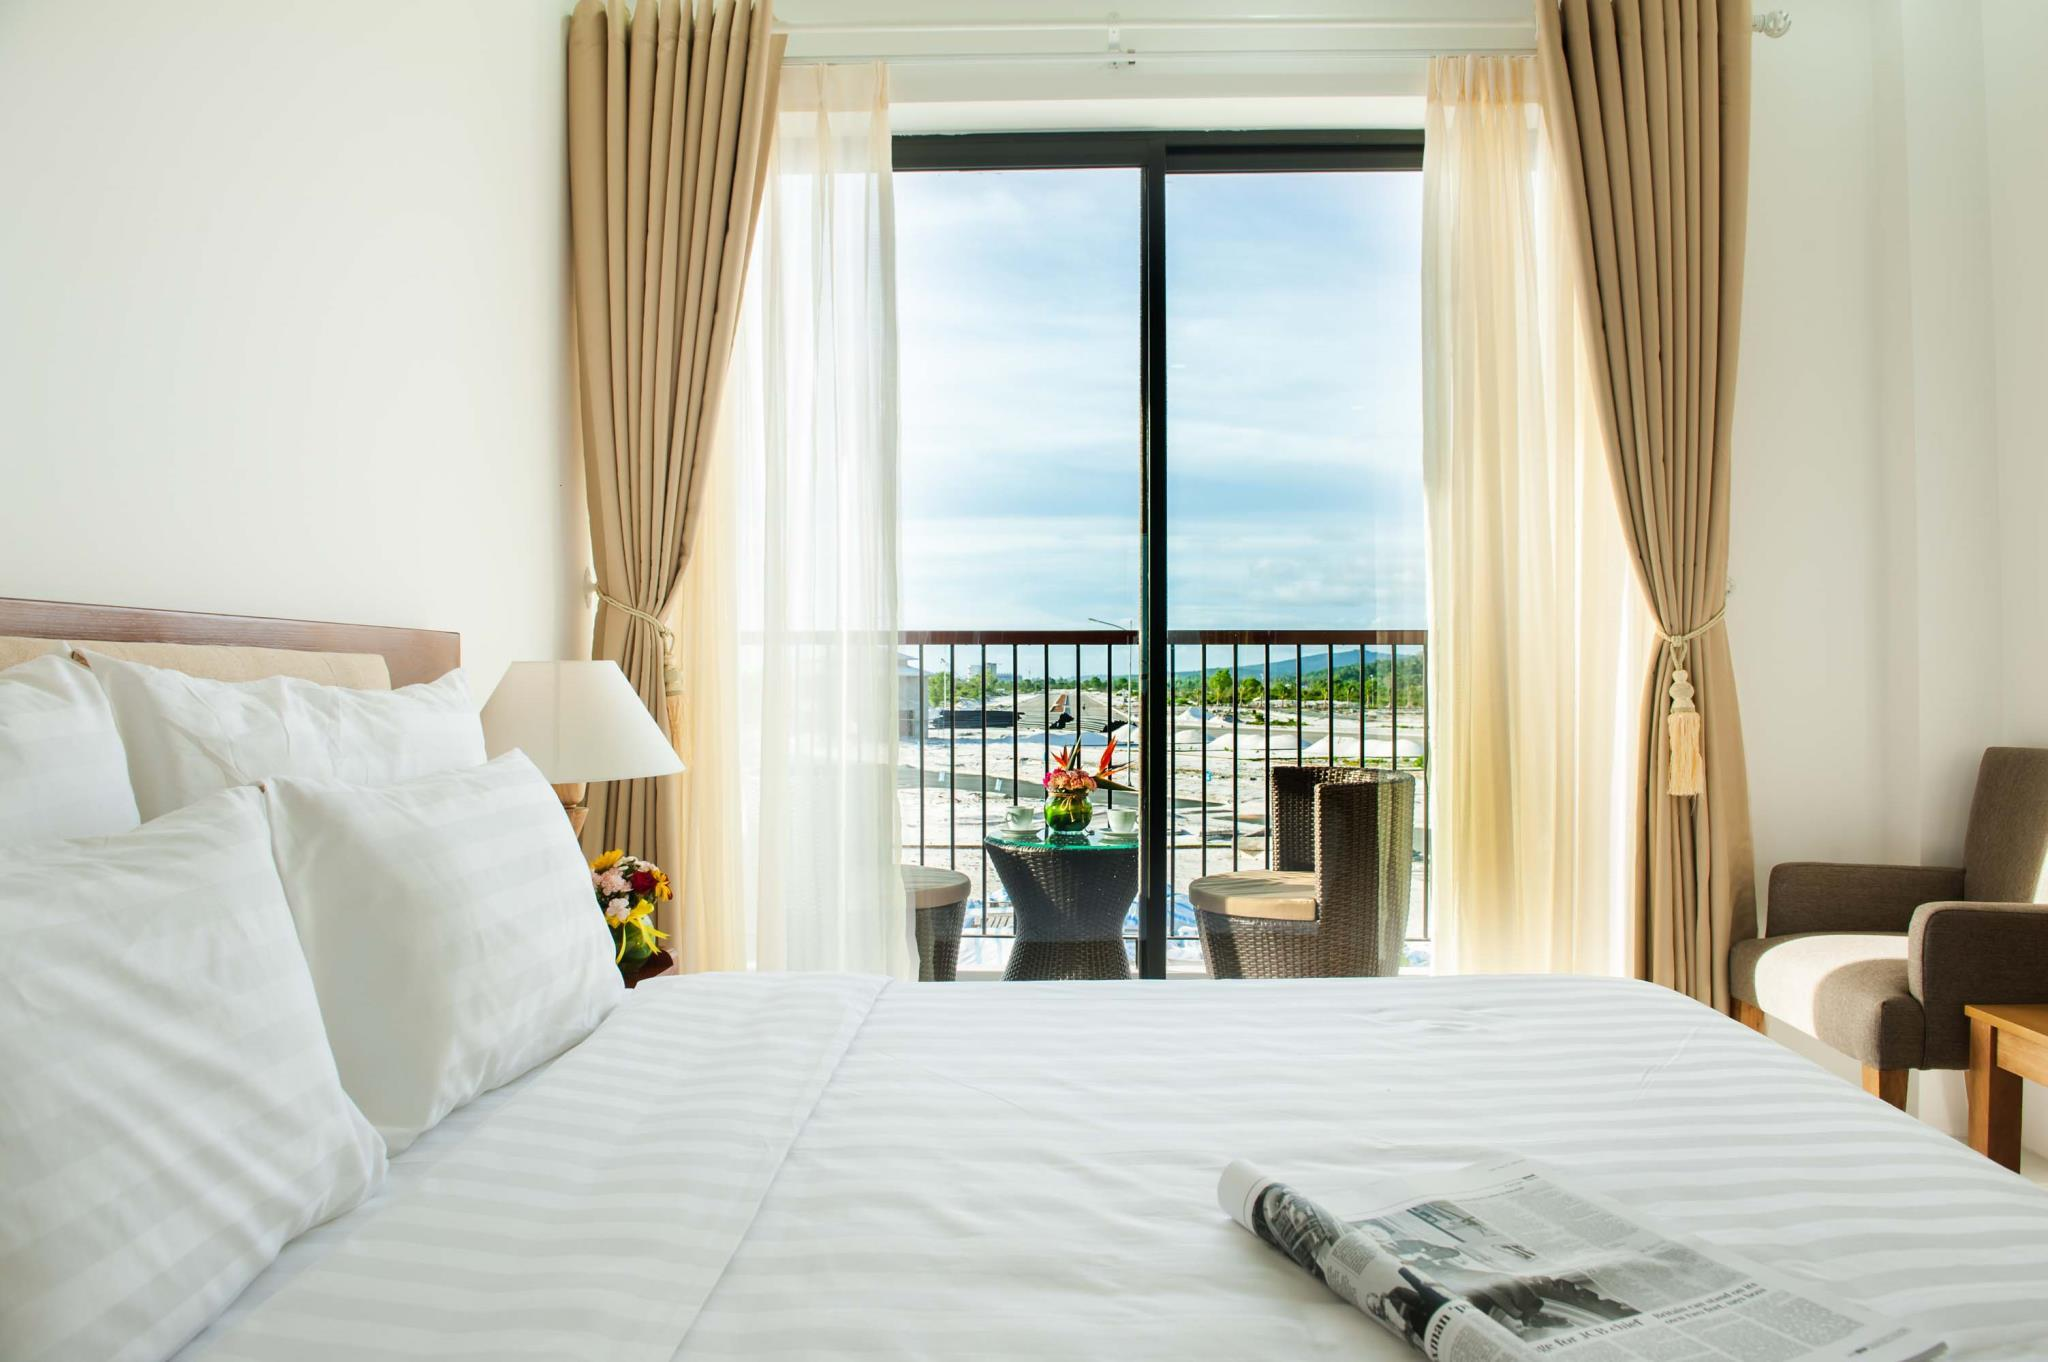 Amon Beach Hotel